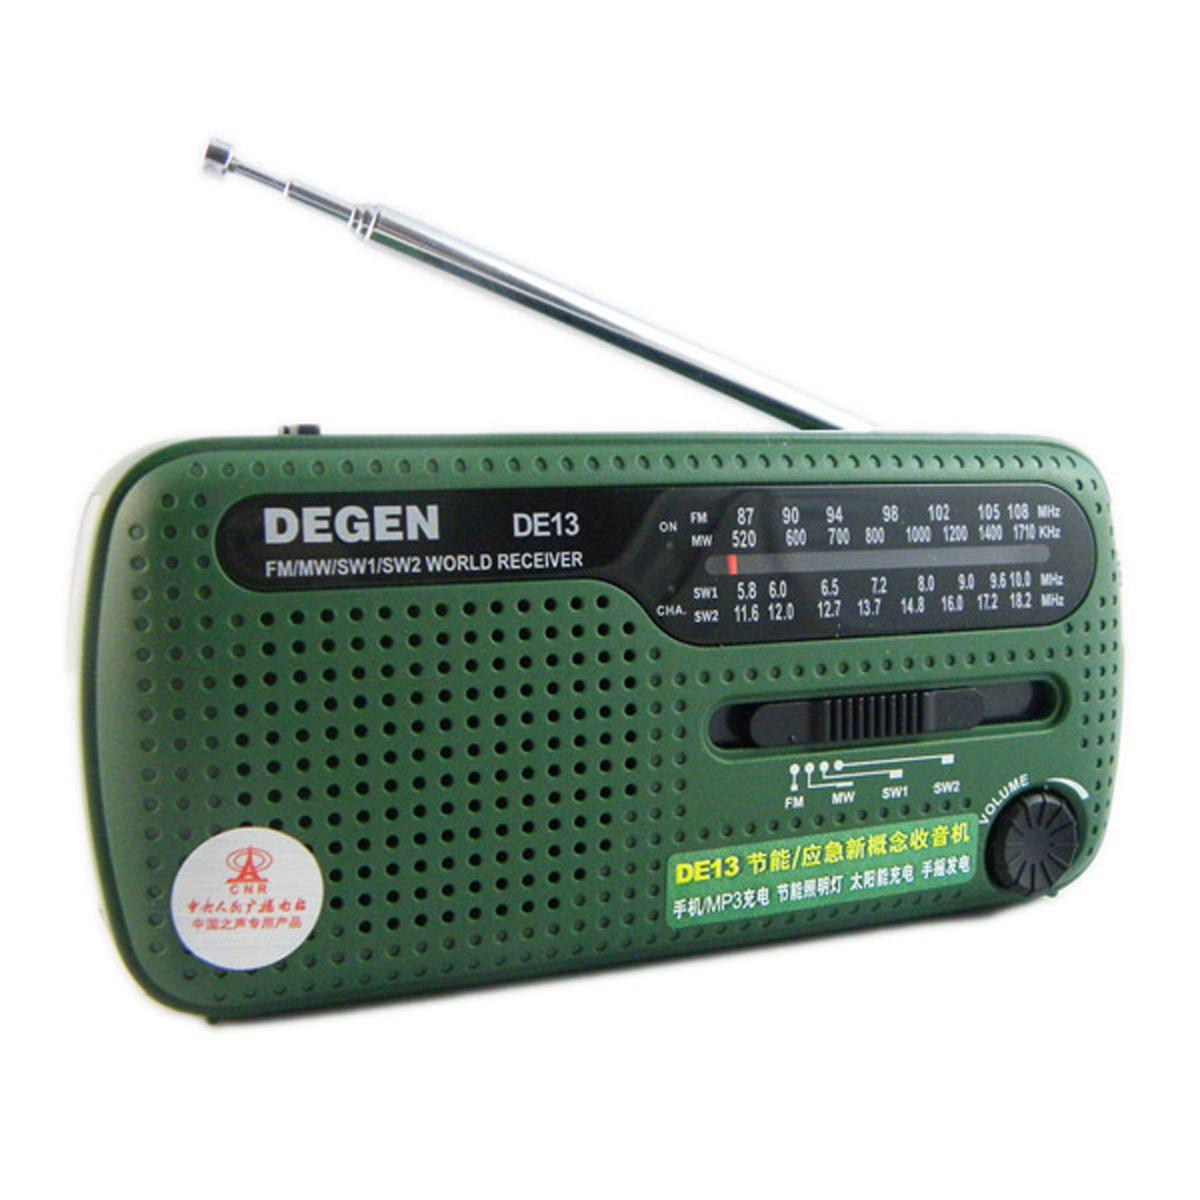 DEGEN Degen DE13 Outdoor Radio Full Band Solar Hand-cranked Power Generation Emergency Alarm English